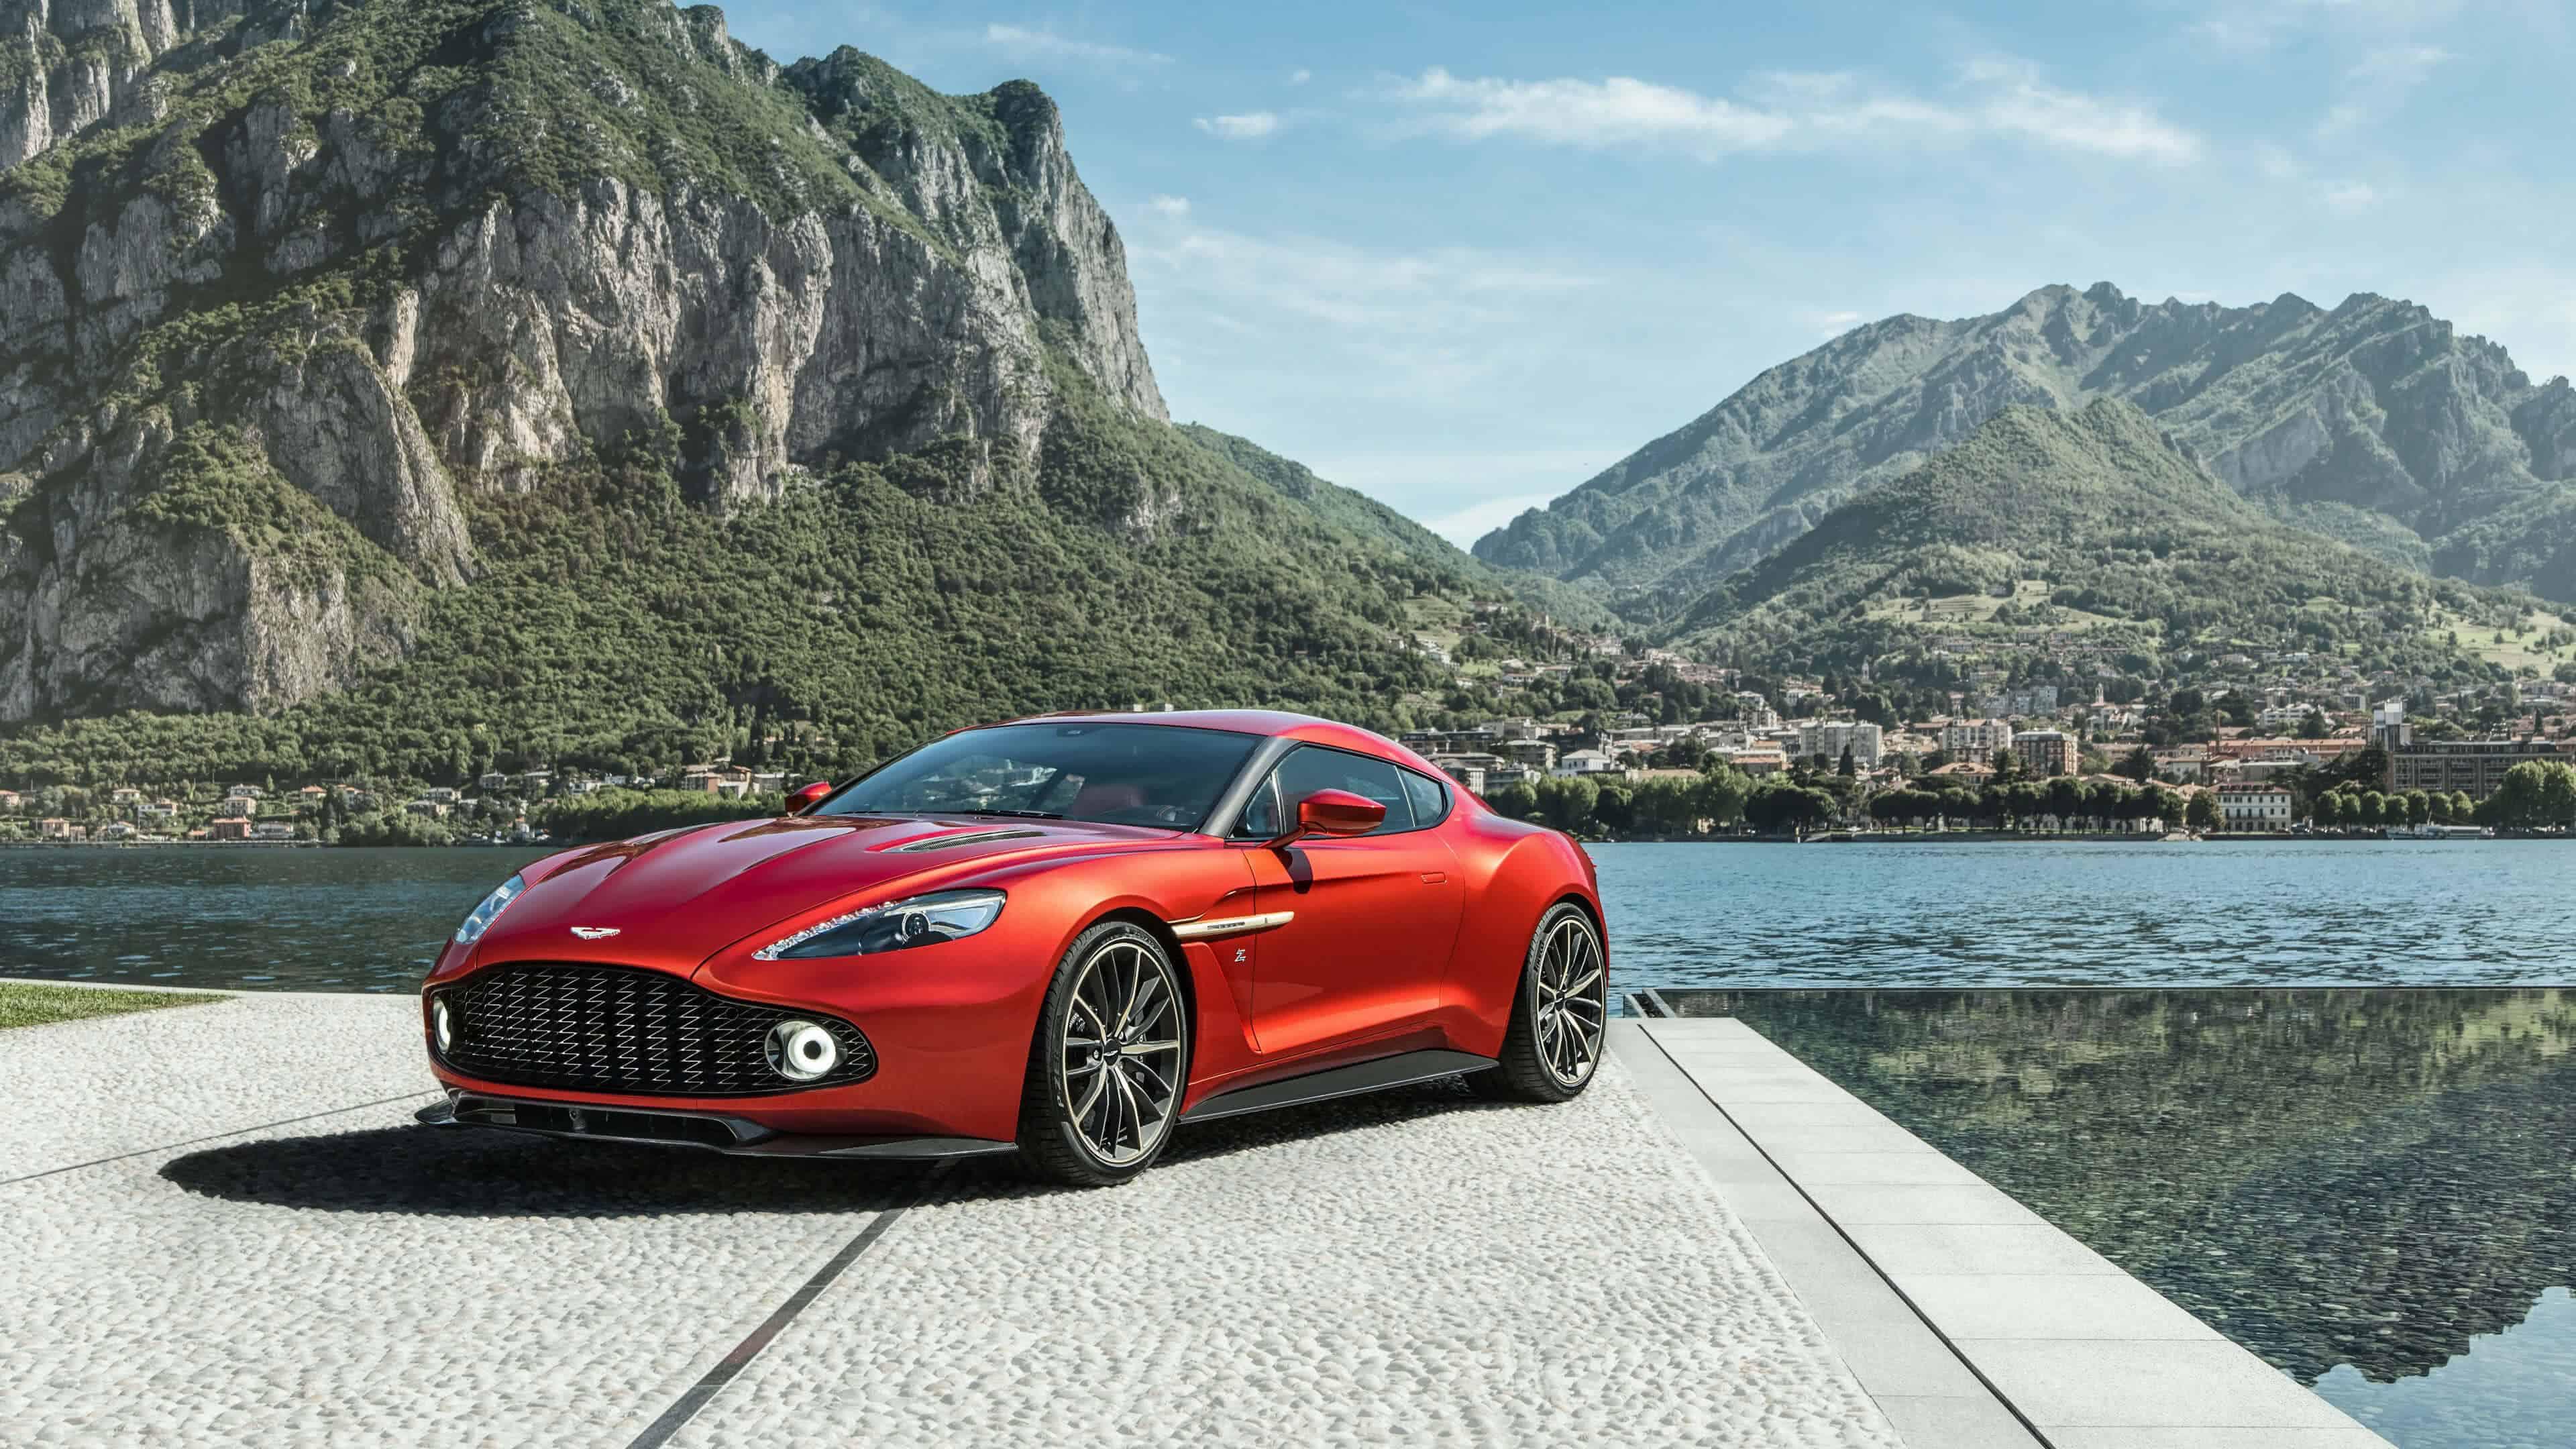 35 Aston Martin Vanquish Wallpapers On Wallpapersafari